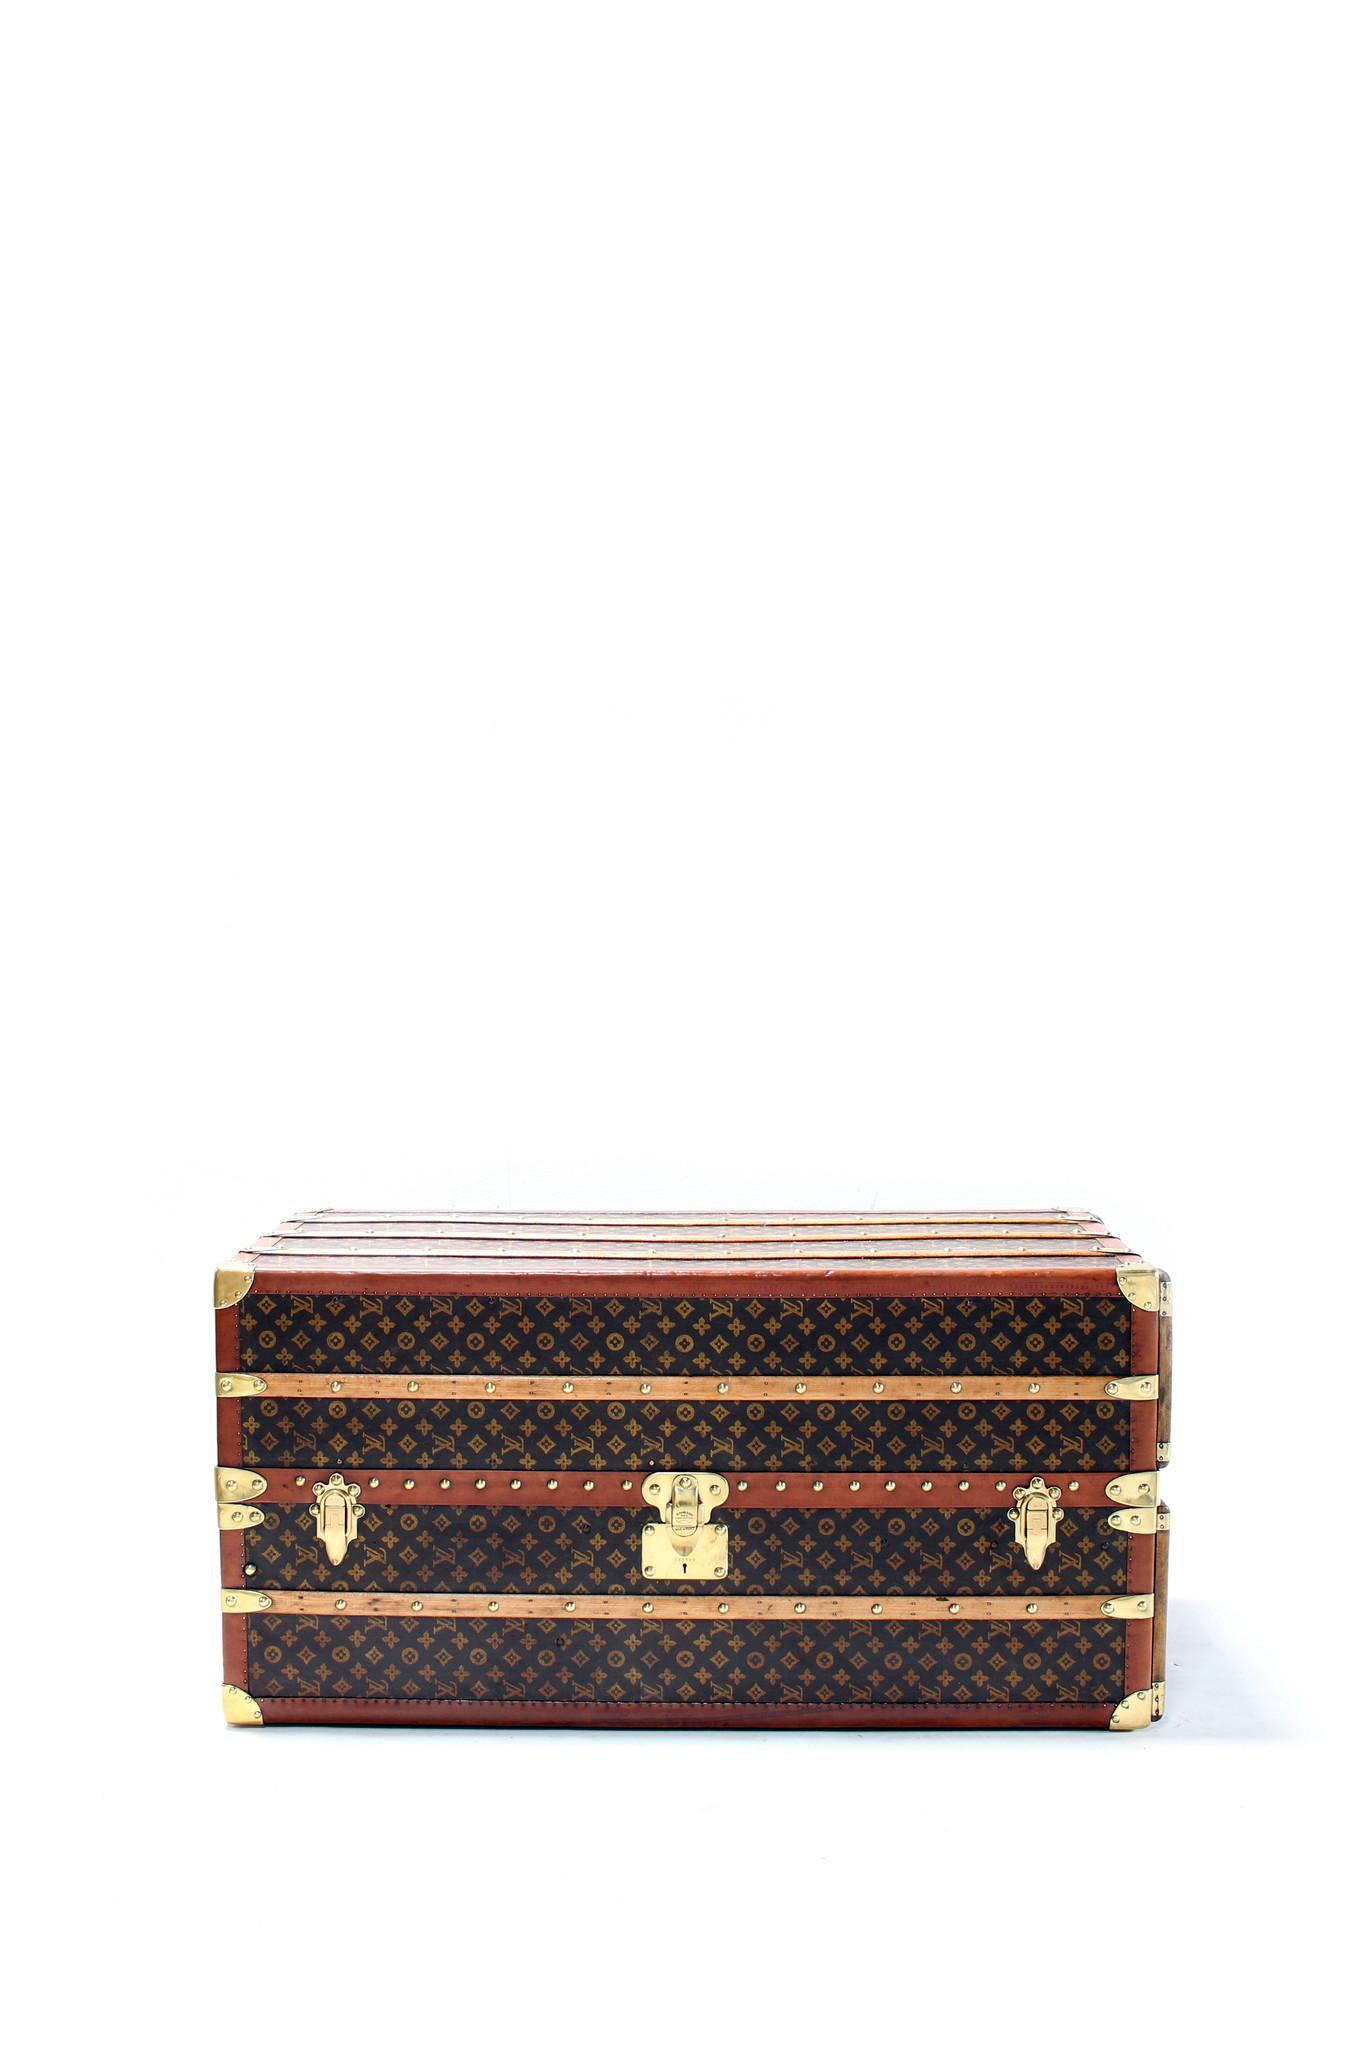 Louis Vuitton garderobe, 1930s